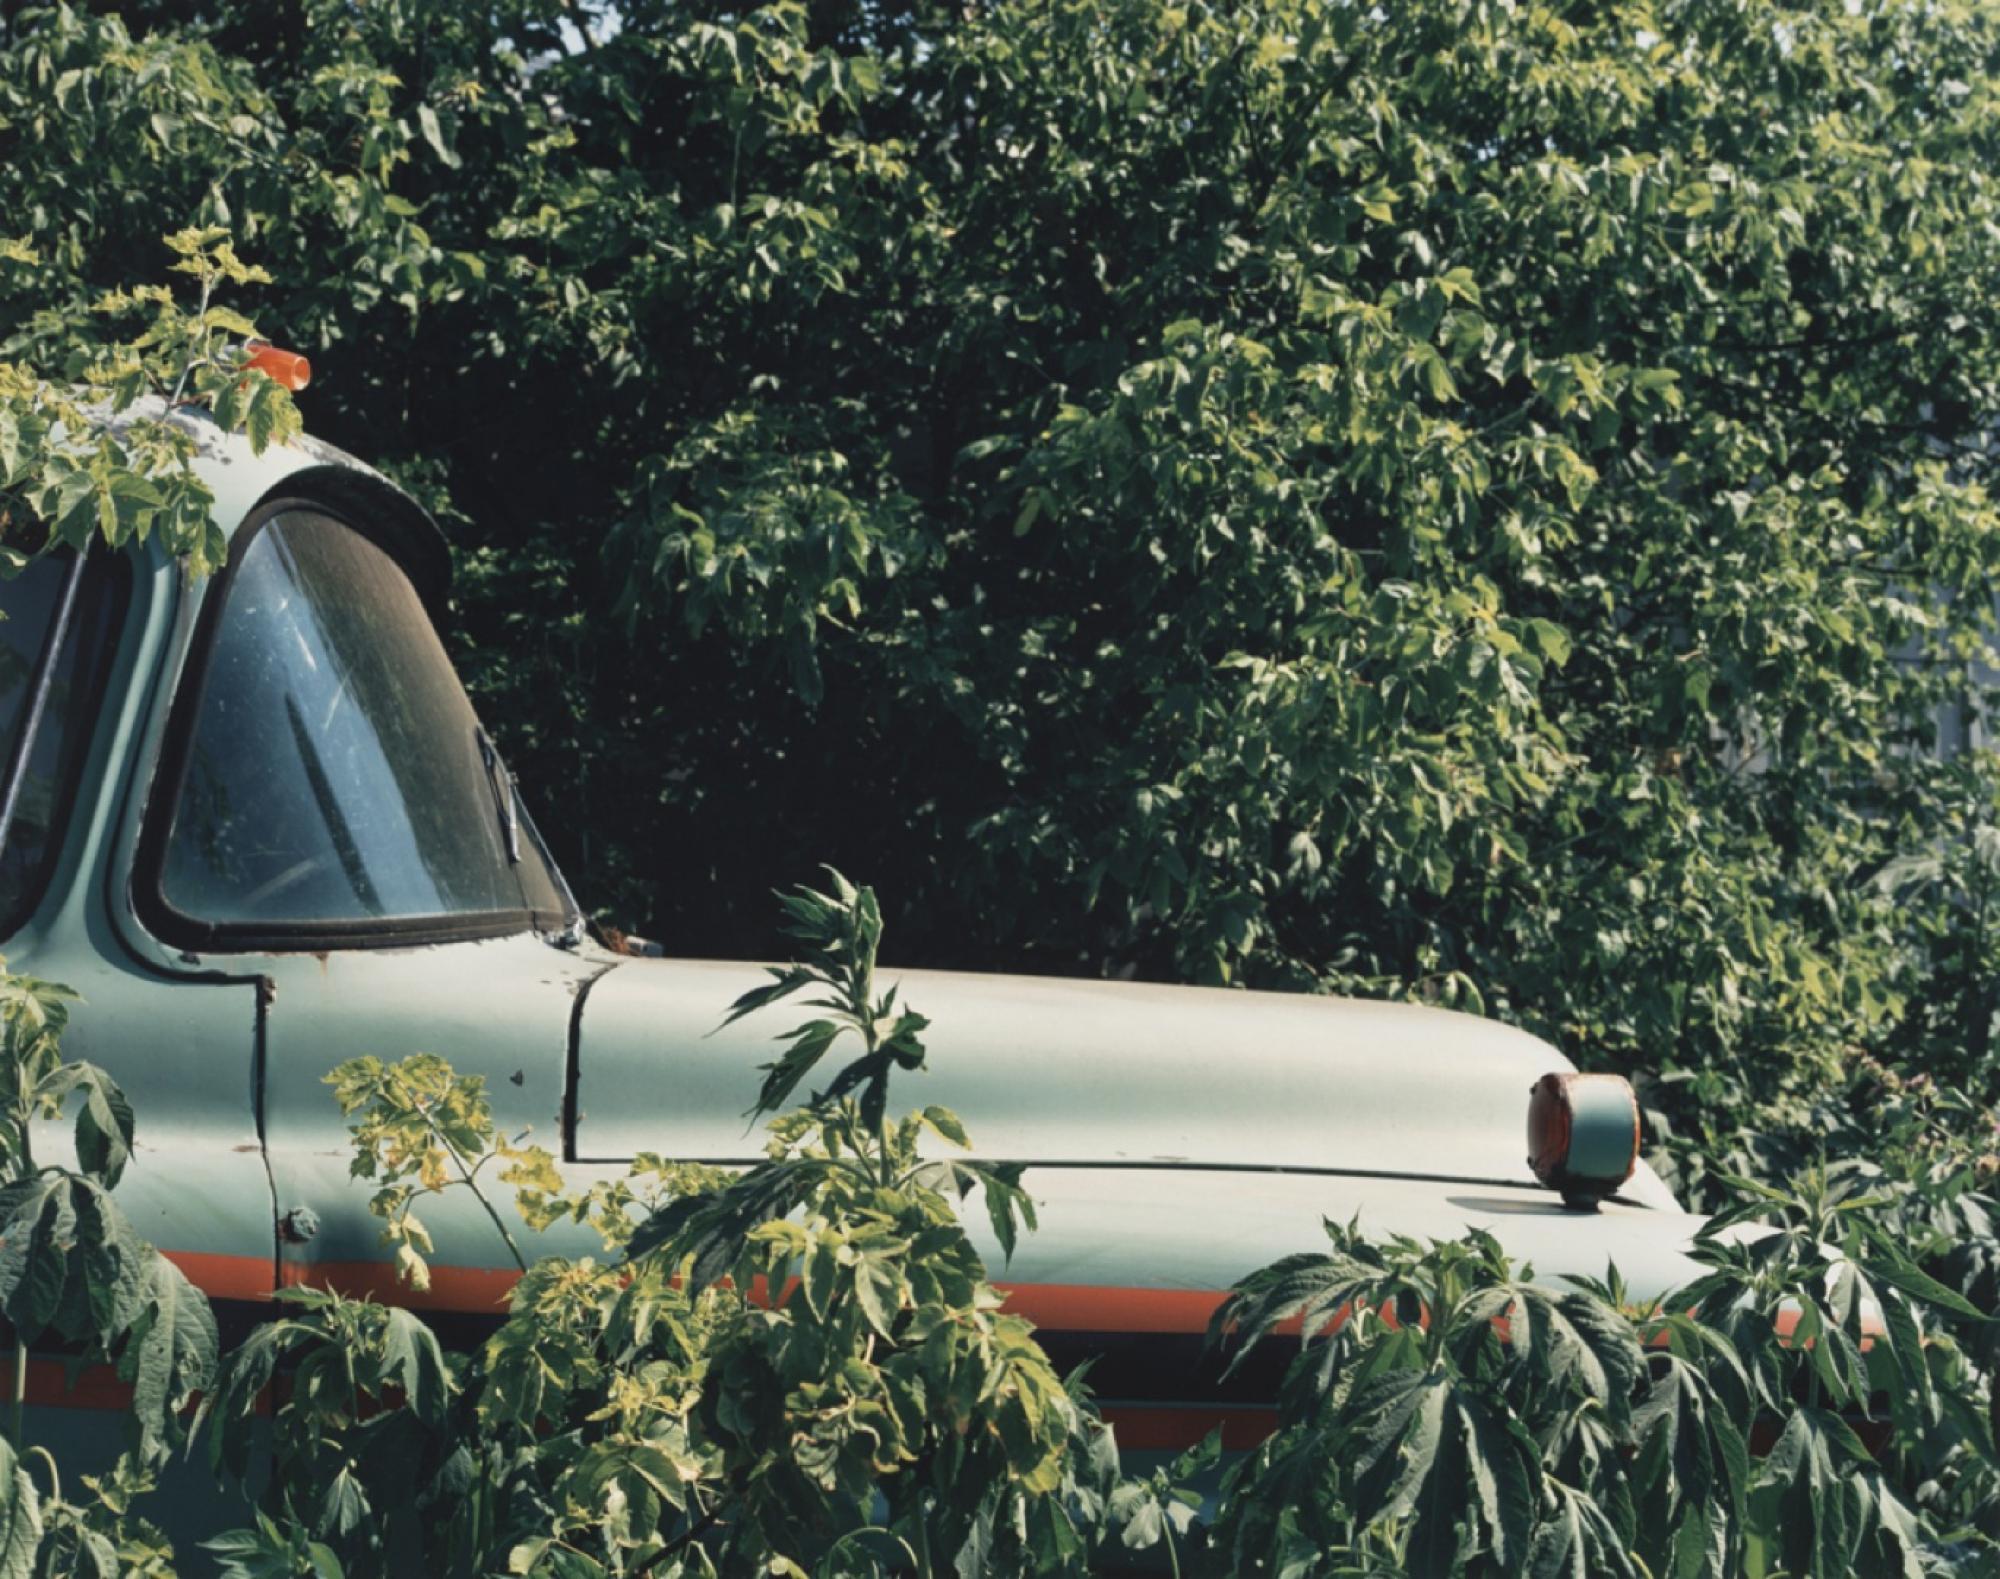 Small Farm and Vehicle Junkyard near Hampshire, Illinois, 1991